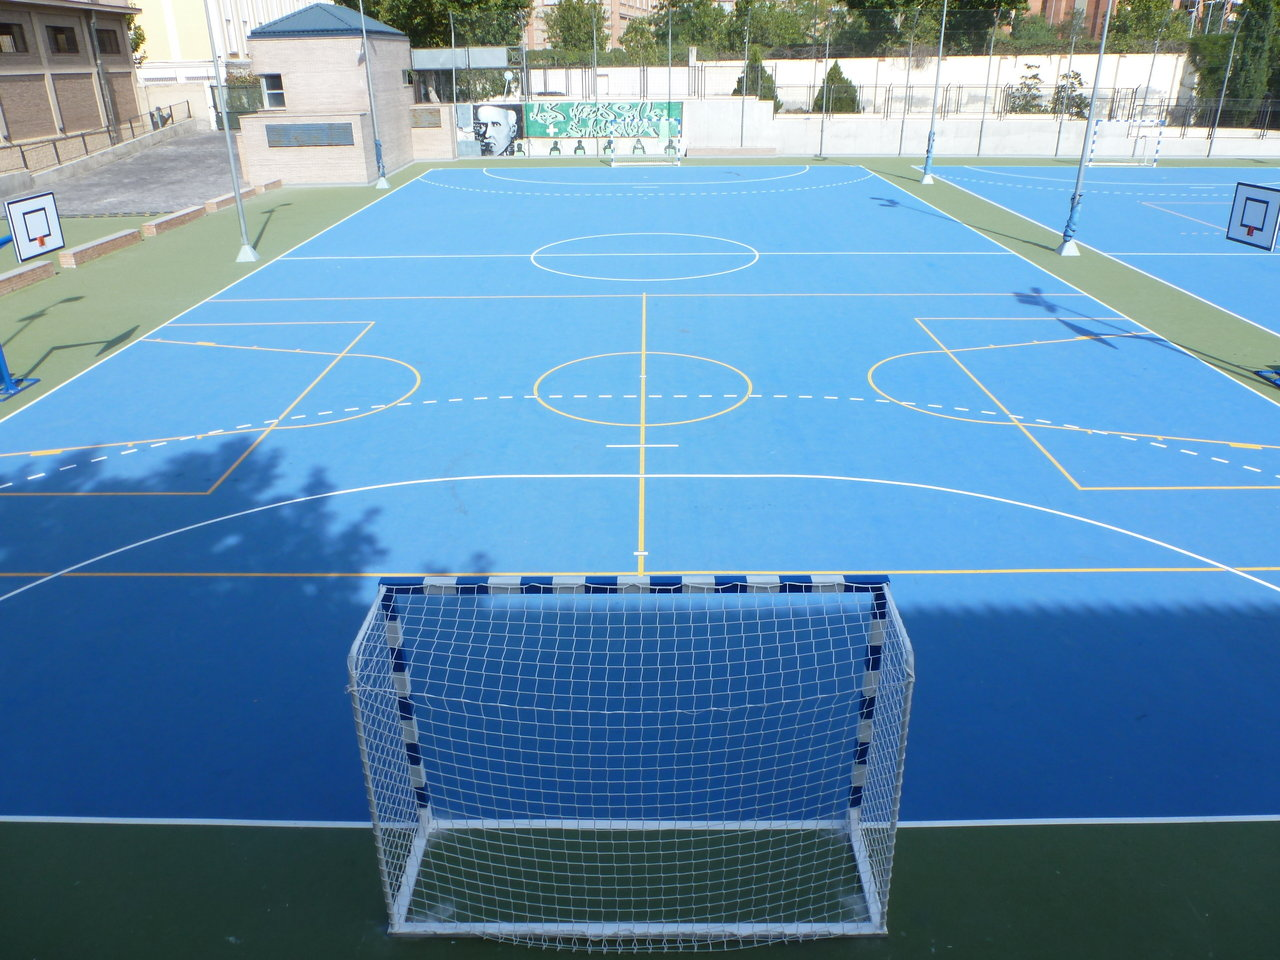 Pista exterior 1 polideportivo genil for Pista de futbol sala medidas